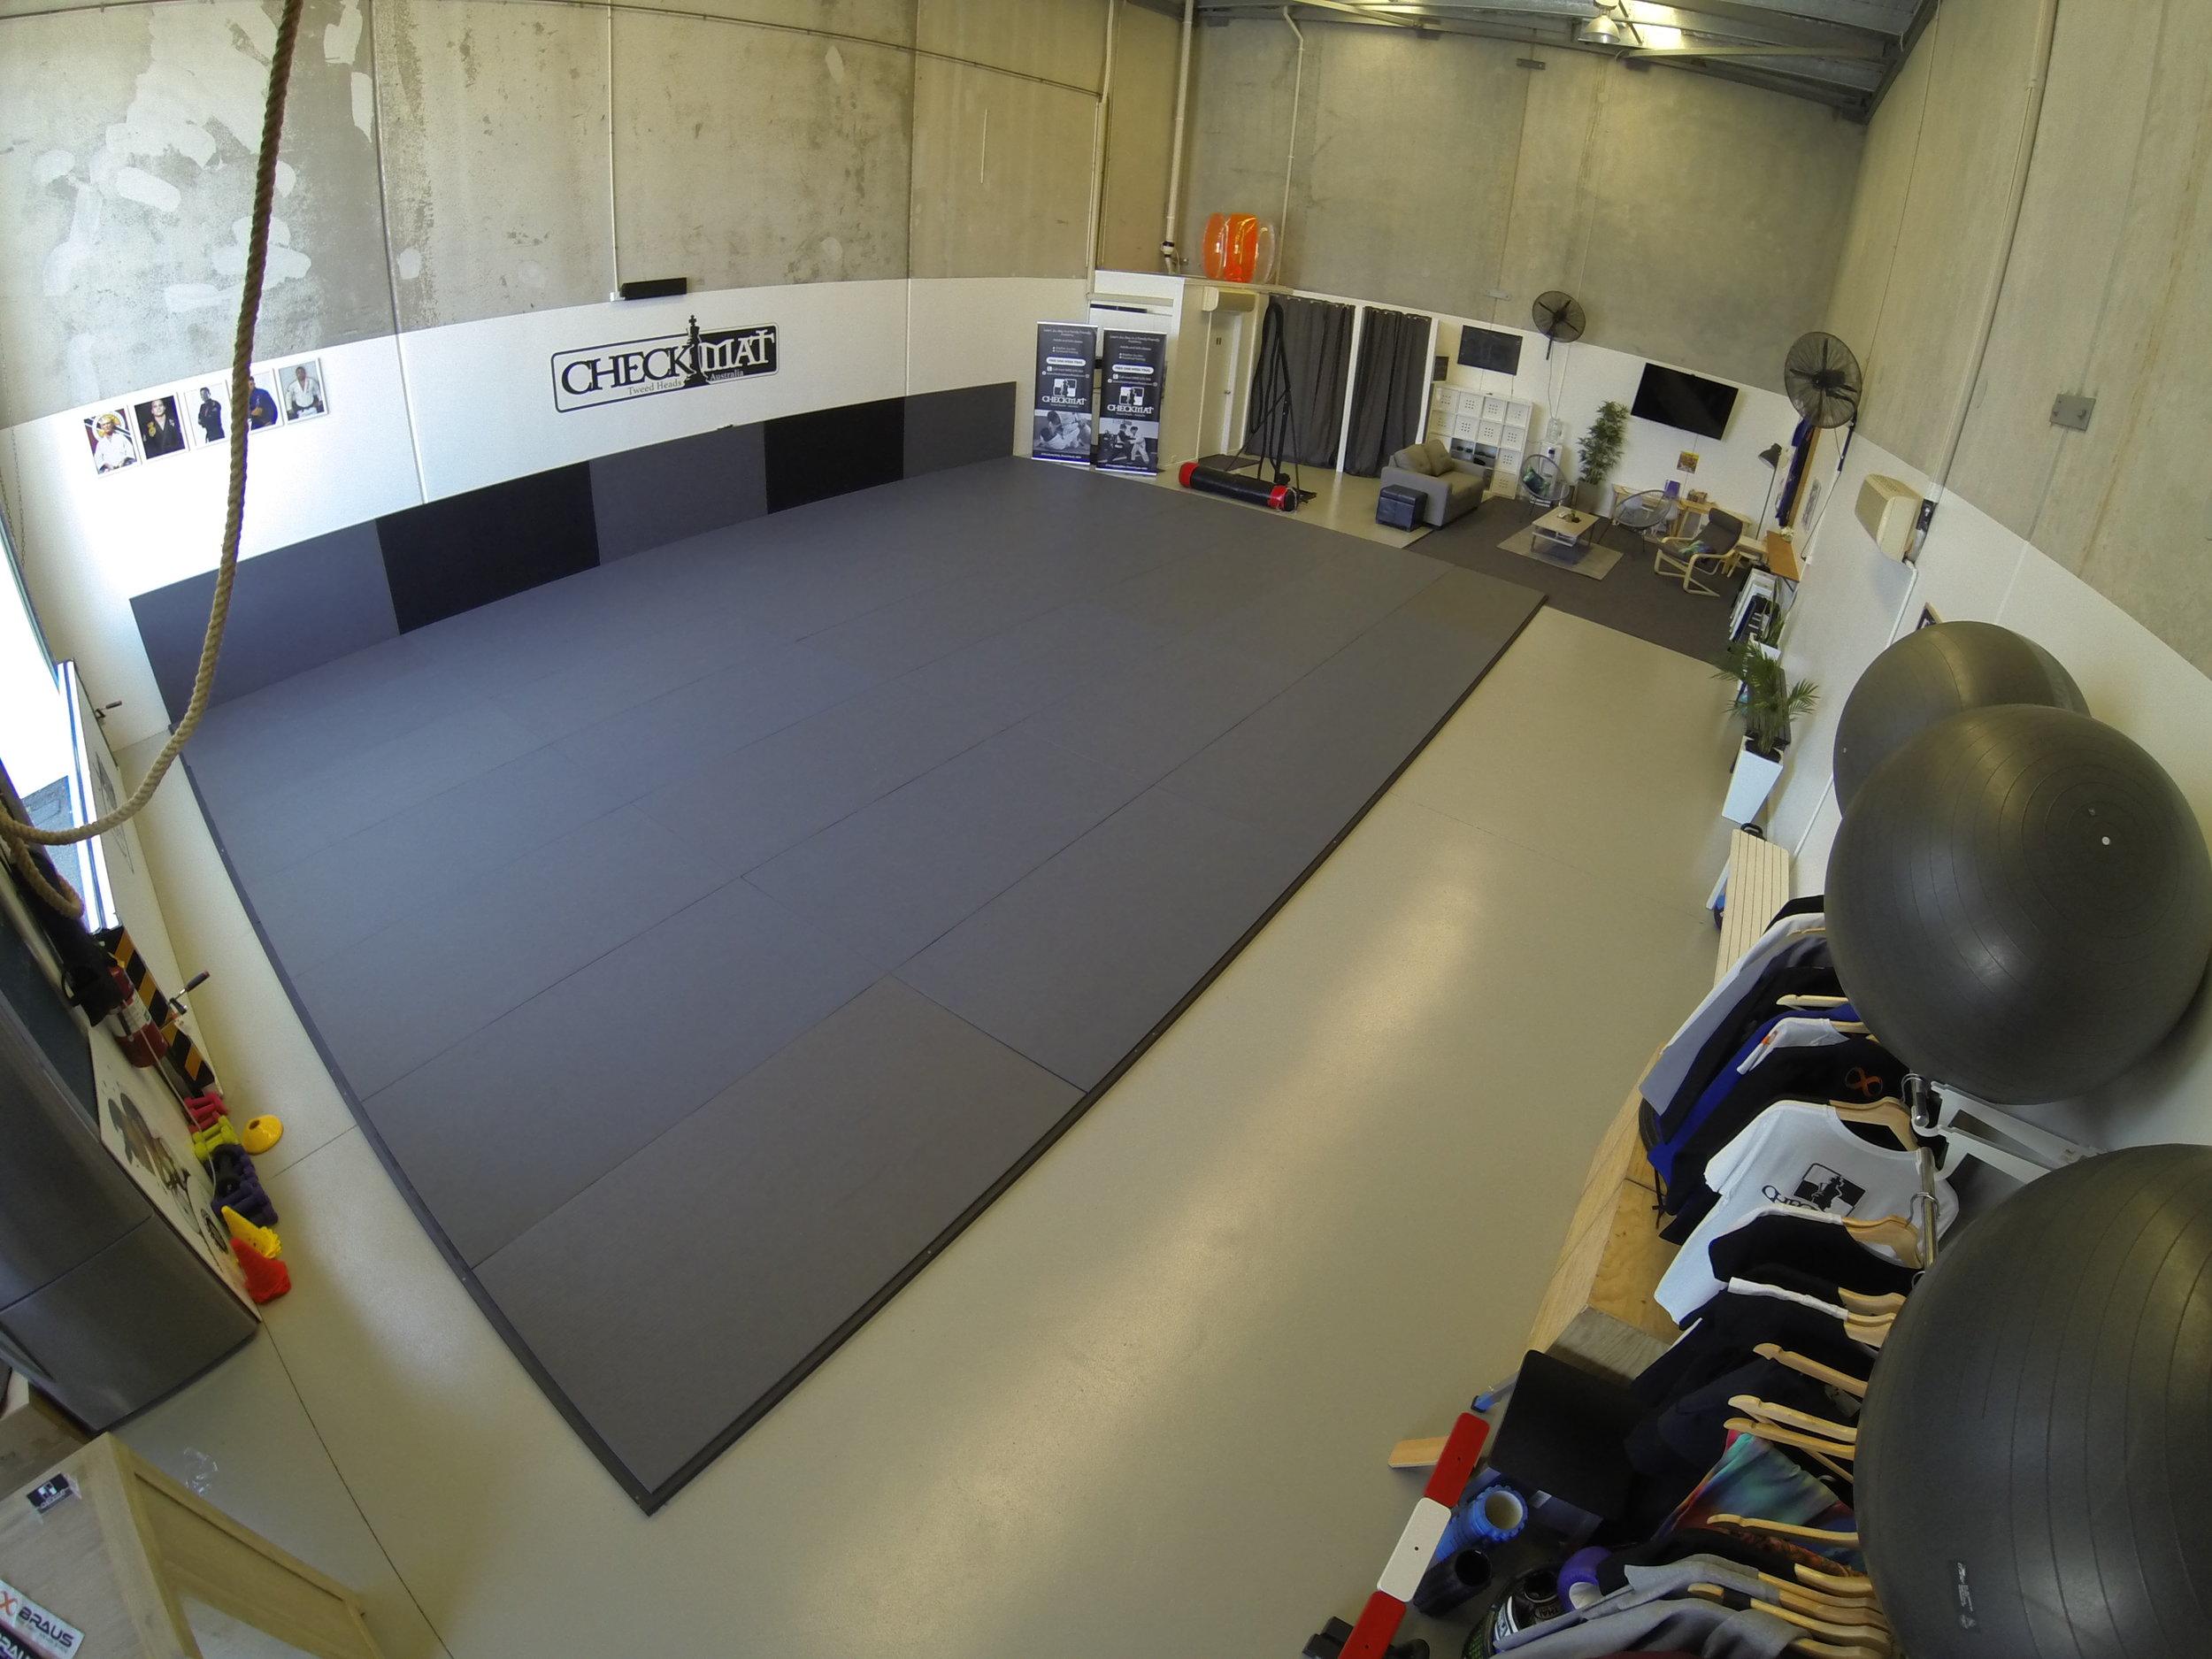 Checkmat Tweed Heads spacious jiu-jitsu academy